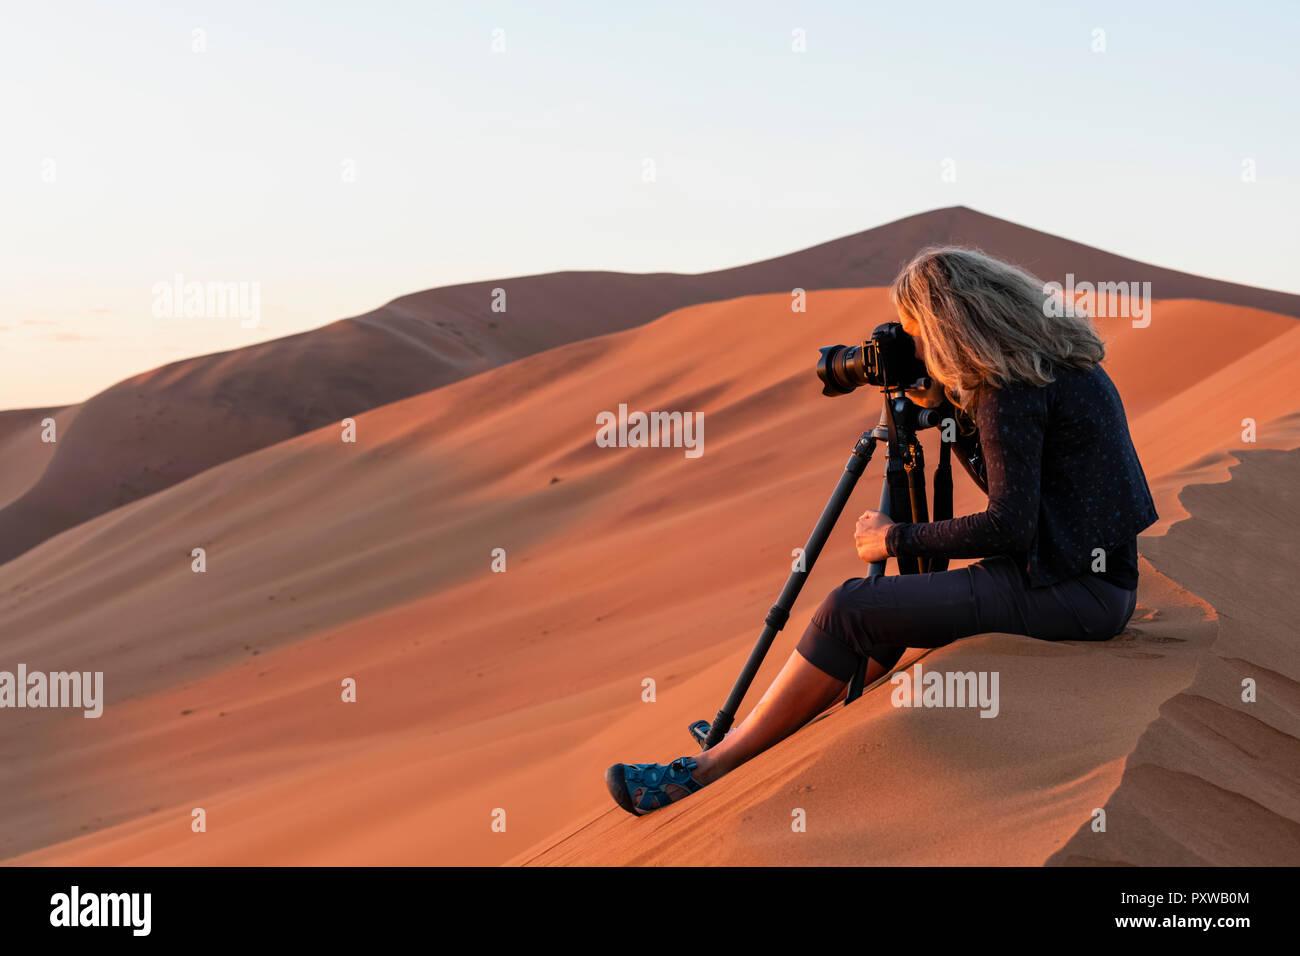 Africa, Namibia, Namib desert, Naukluft National Park, female photograper photographing at early morning light, sitting on sand dune - Stock Image